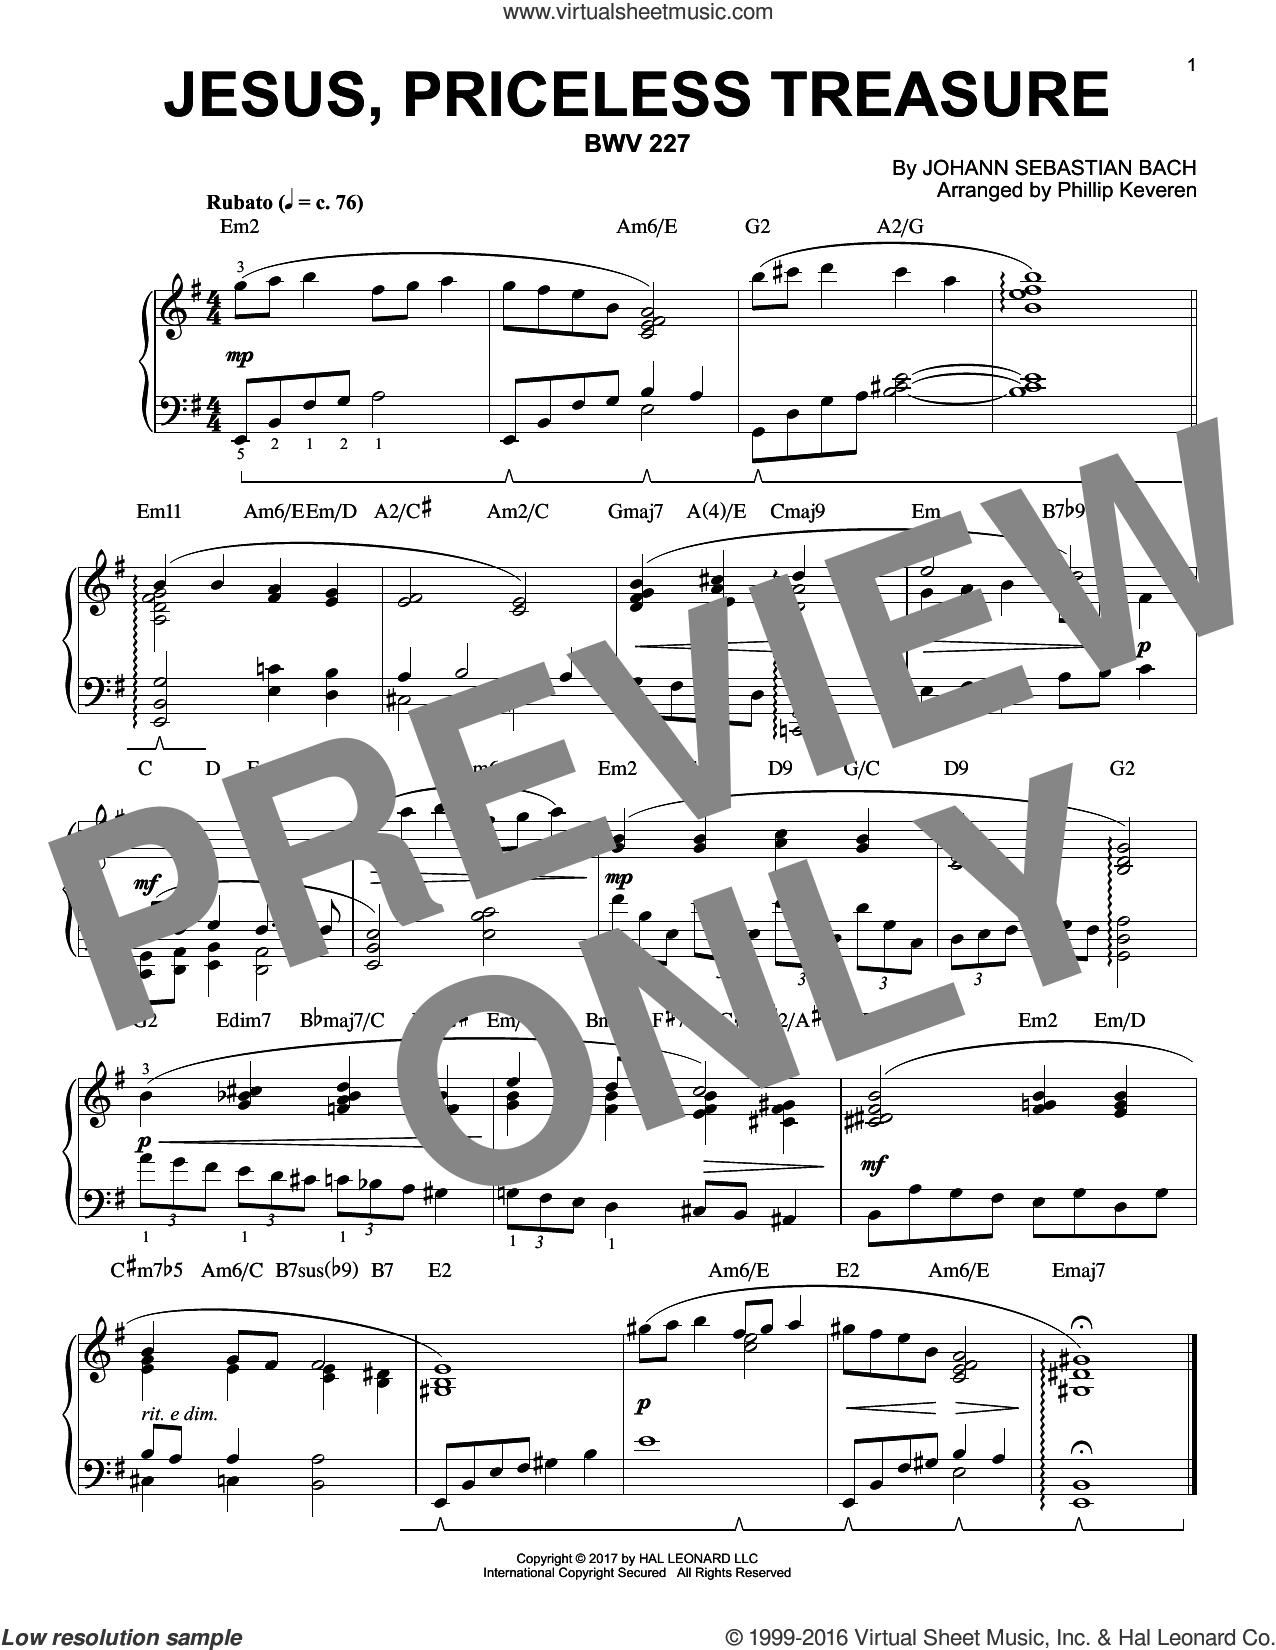 Jesus, Priceless Treasure, BWV 227 [Jazz version] (arr. Phillip Keveren) sheet music for piano solo by Johann Sebastian Bach and Phillip Keveren, classical score, intermediate skill level